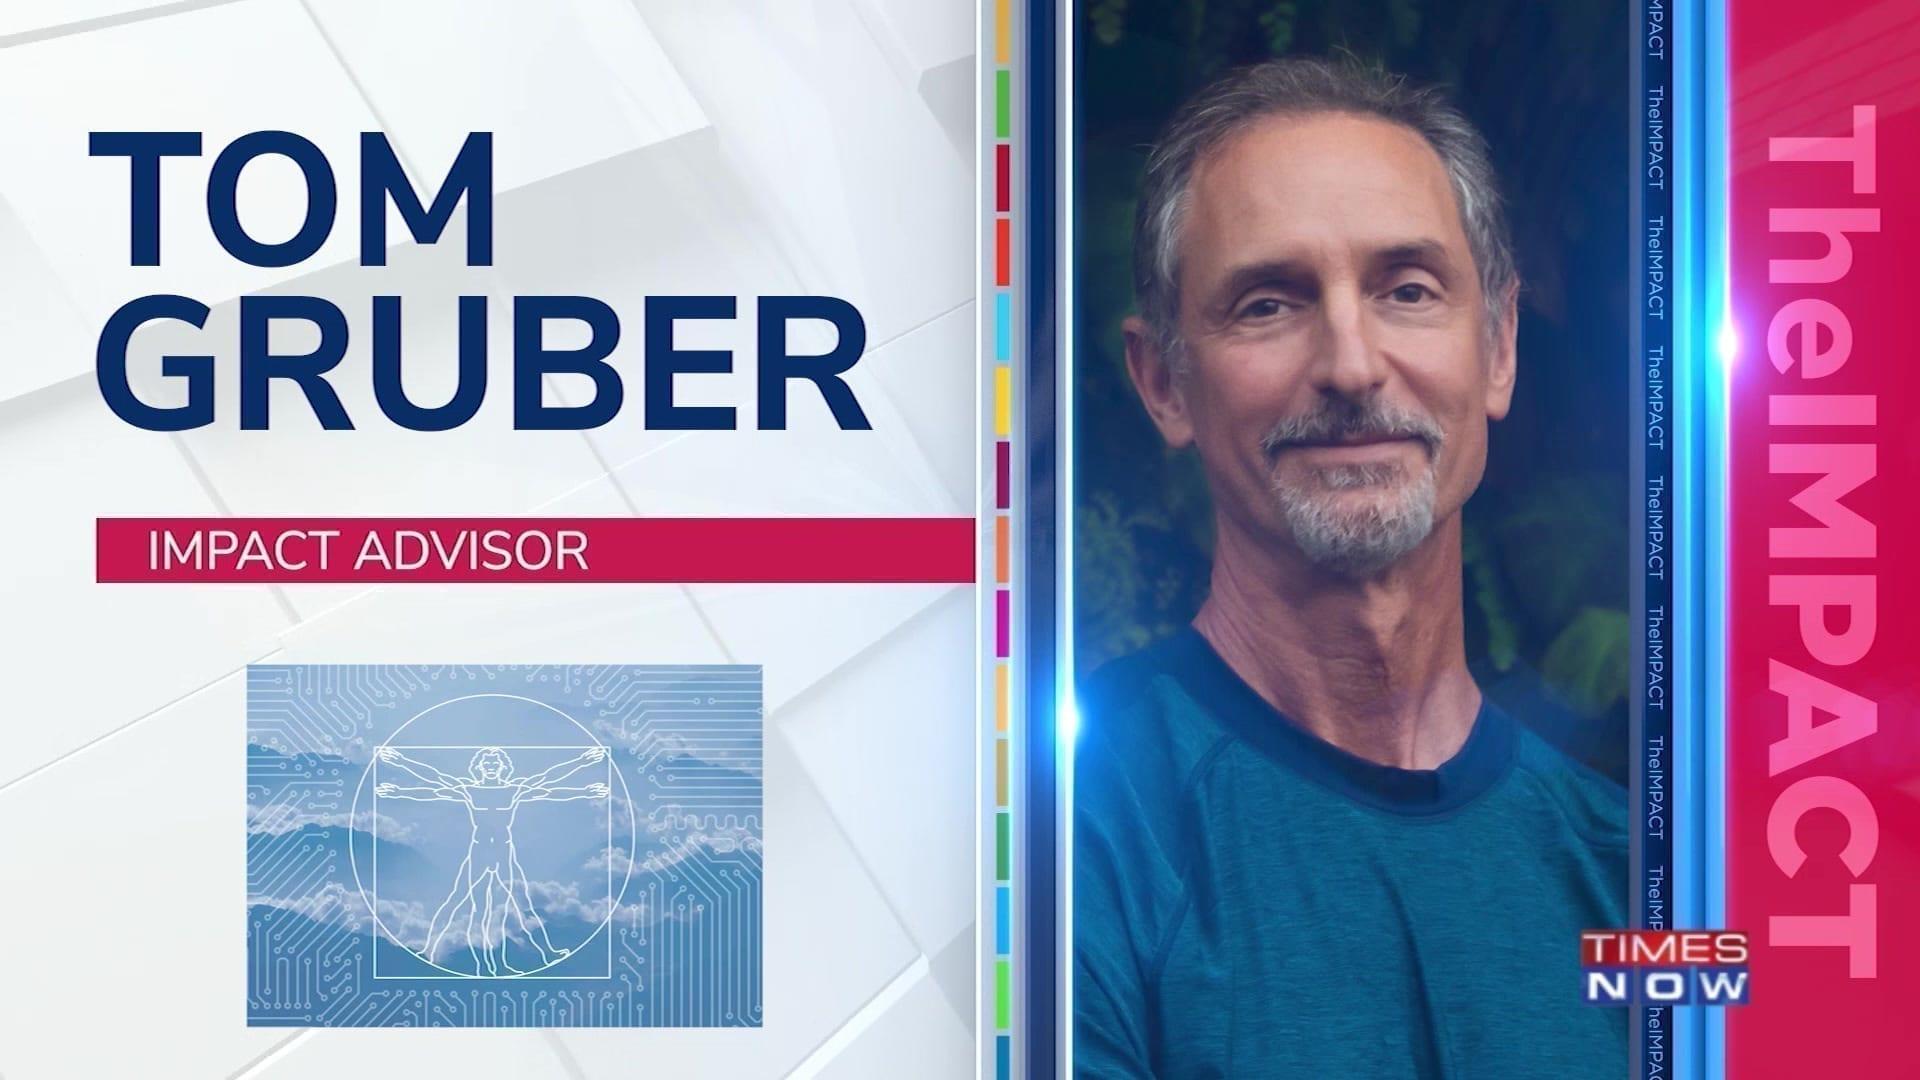 Tom Gruber, Impact Advisor & Founder of Humanistic AI